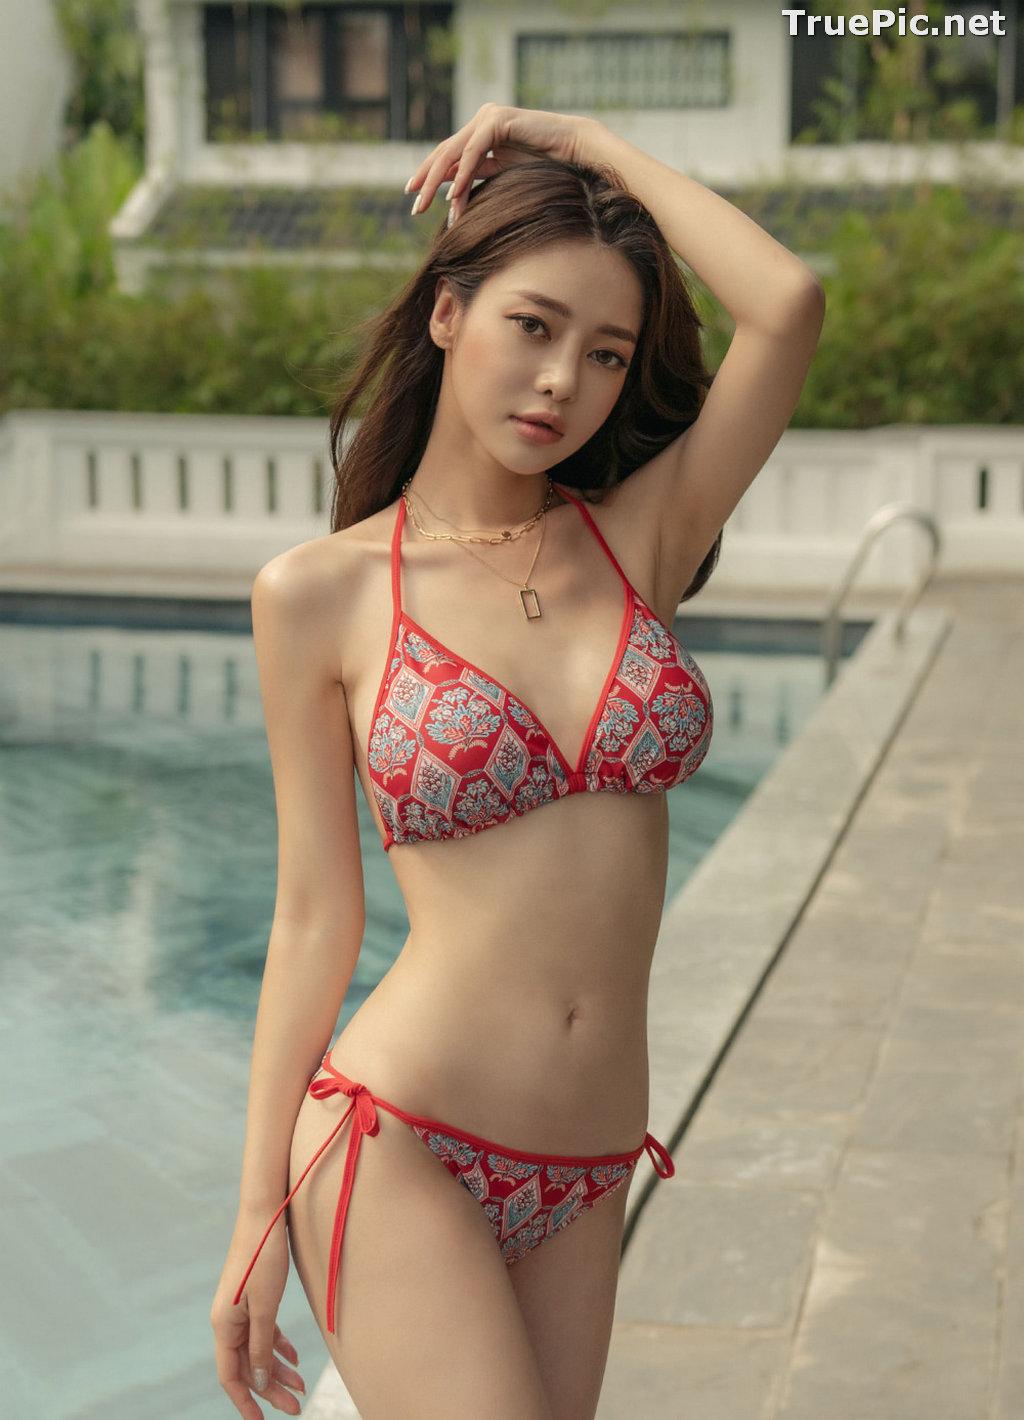 Image Korean Fashion Model - Kim Moon Hee - Hestia Slim Bikini - TruePic.net - Picture-1